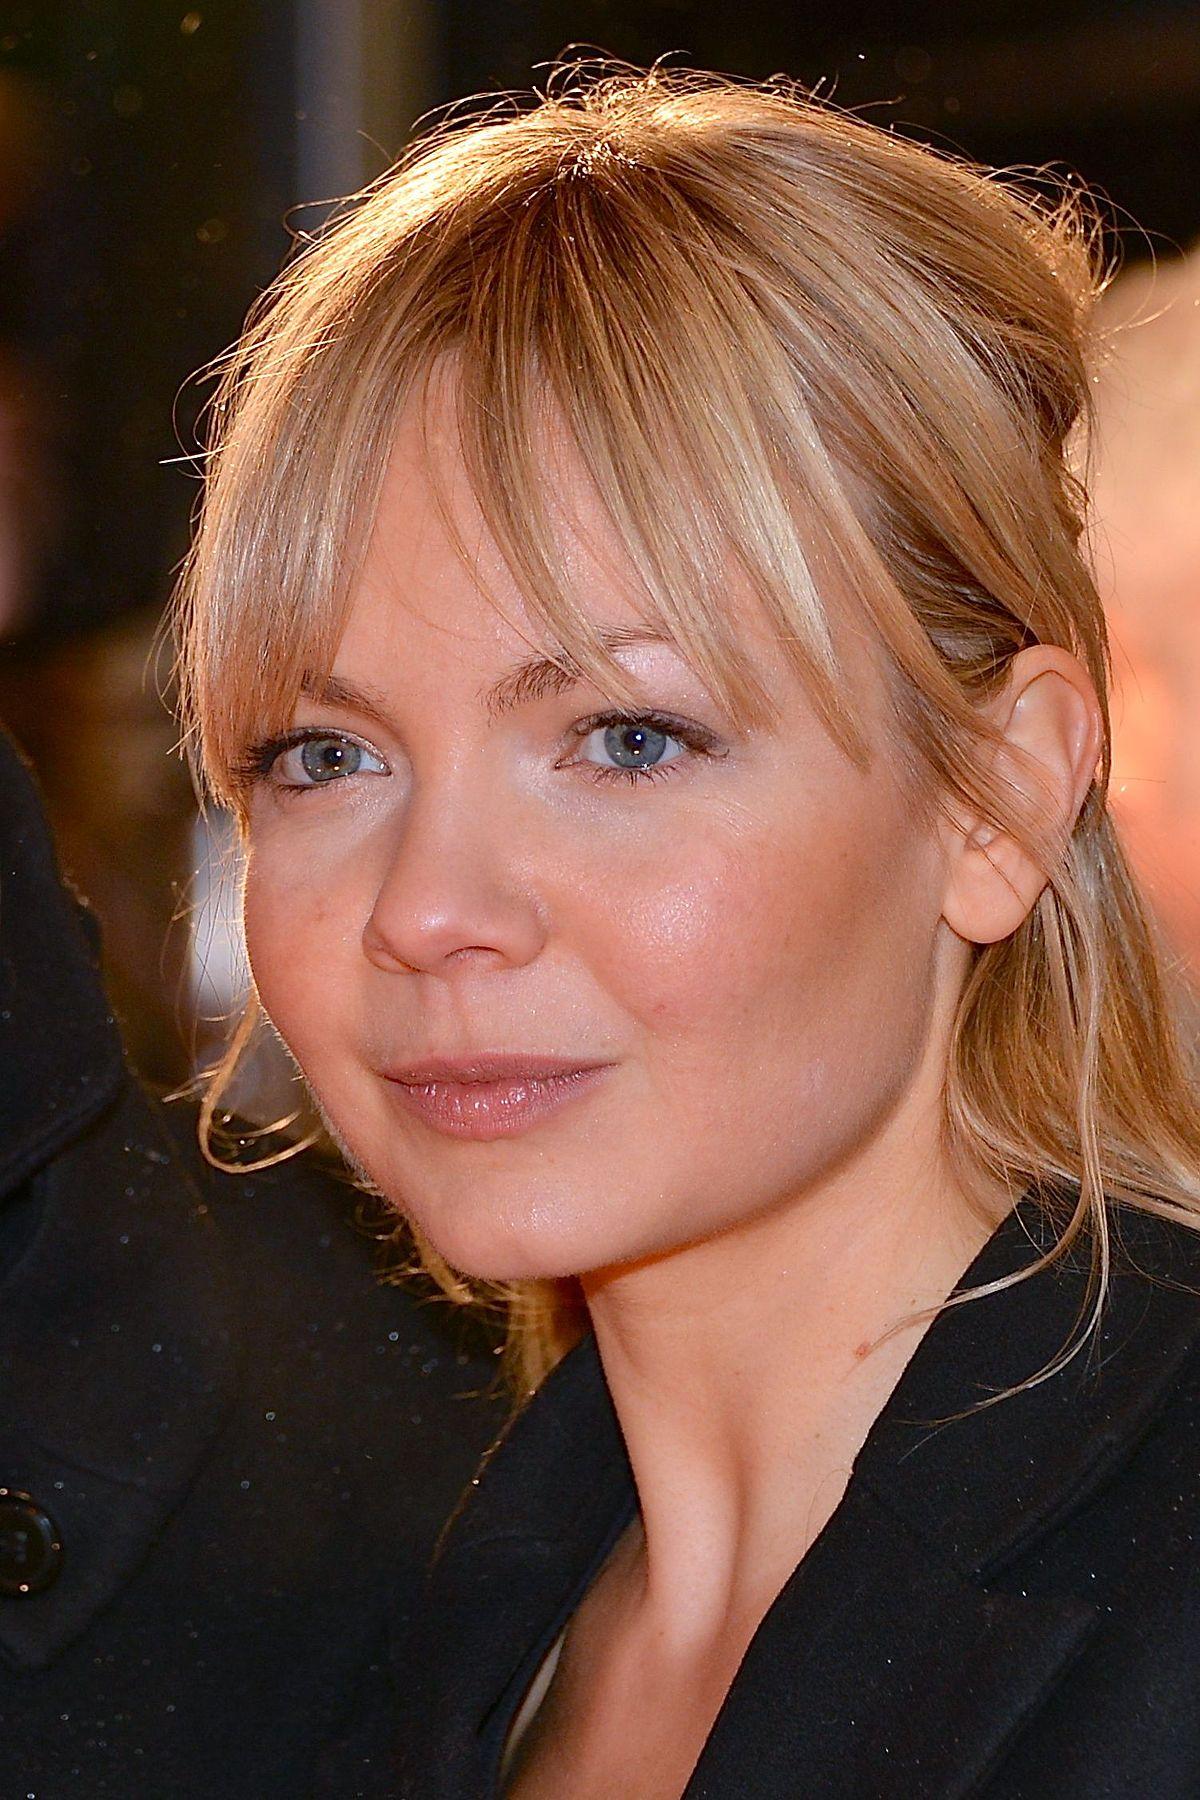 http://upload.wikimedia.org/wikipedia/commons/thumb/4/43/Marie_Robertson.jpg/1200px-Marie_Robertson.jpg